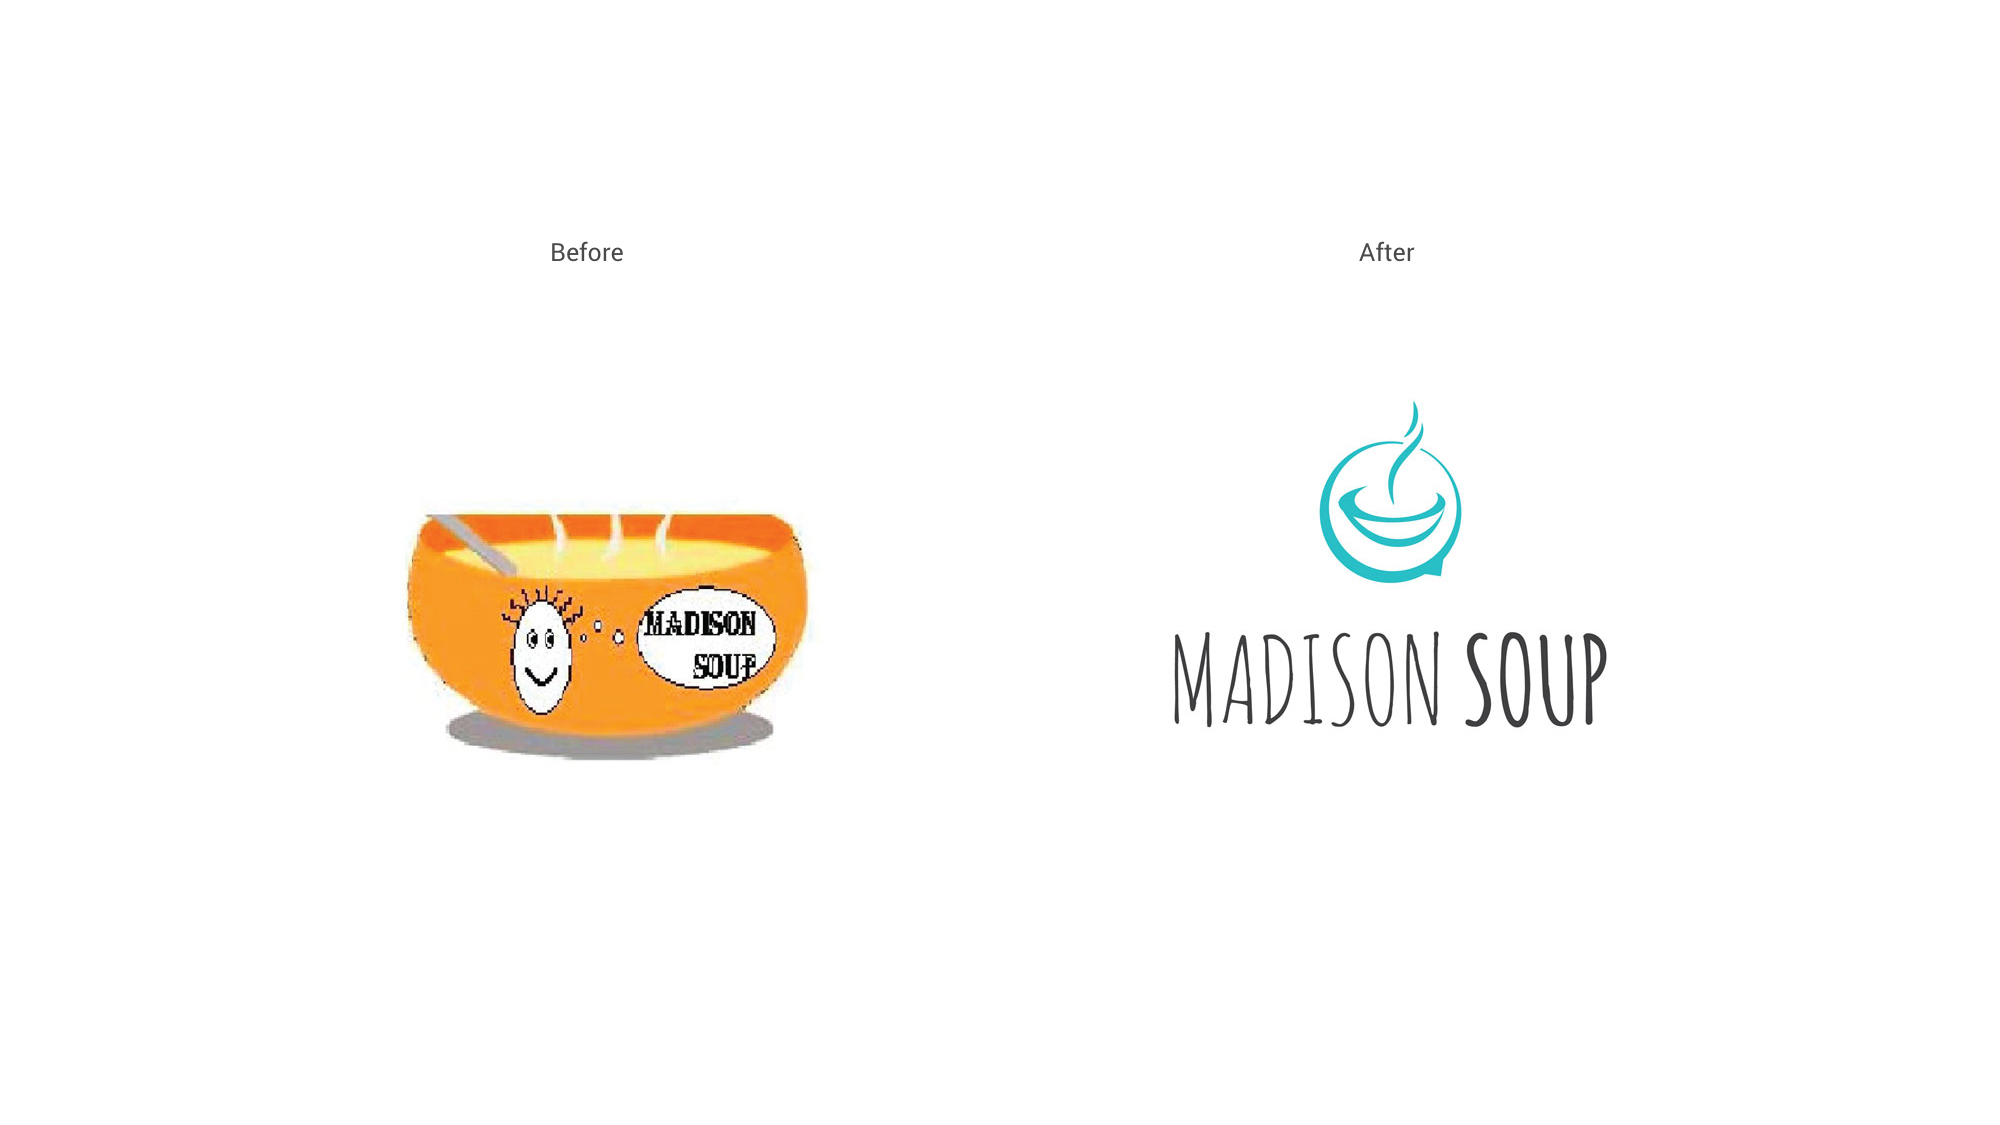 Madison Soup